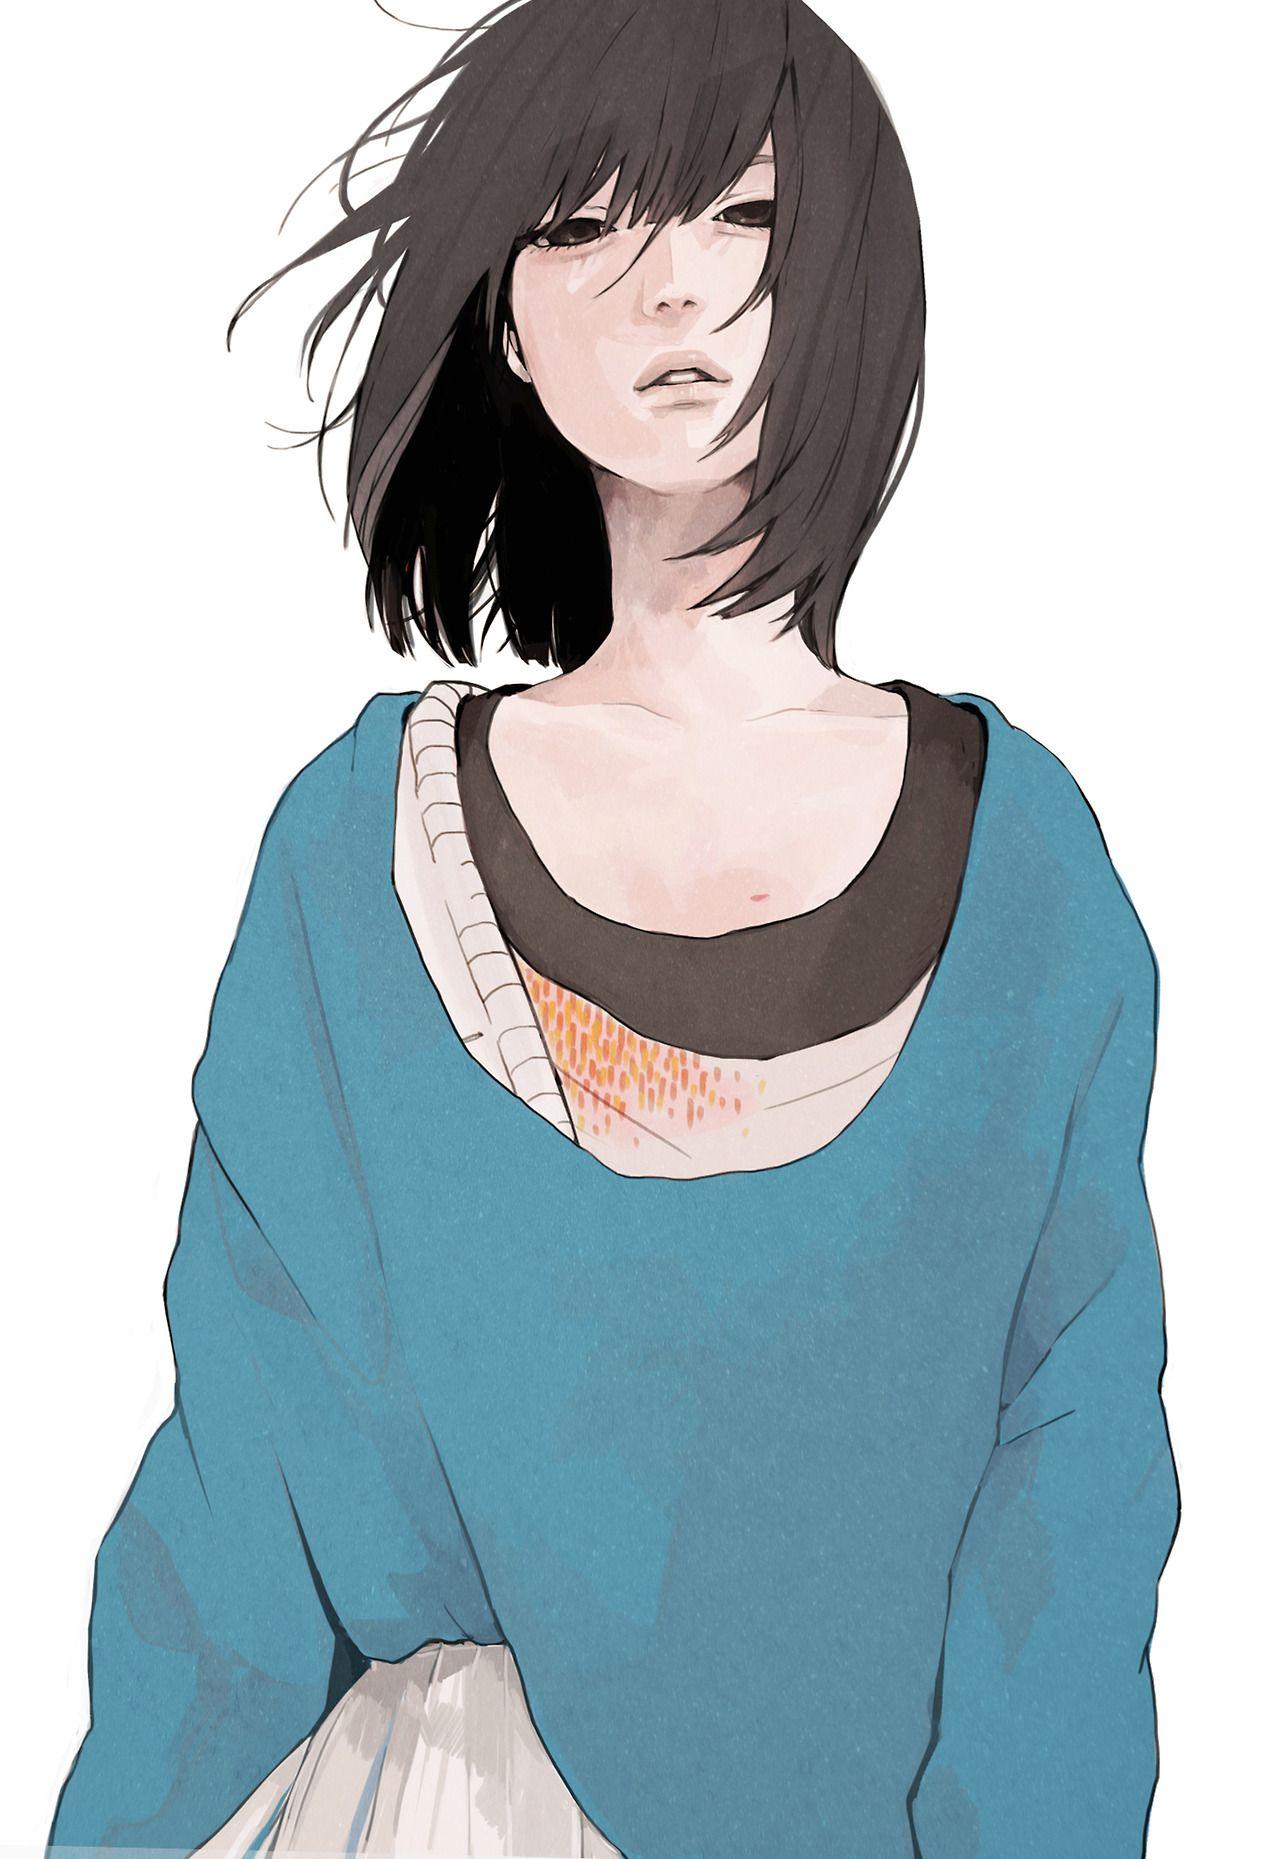 snnn illustration Illustrations Pinterest